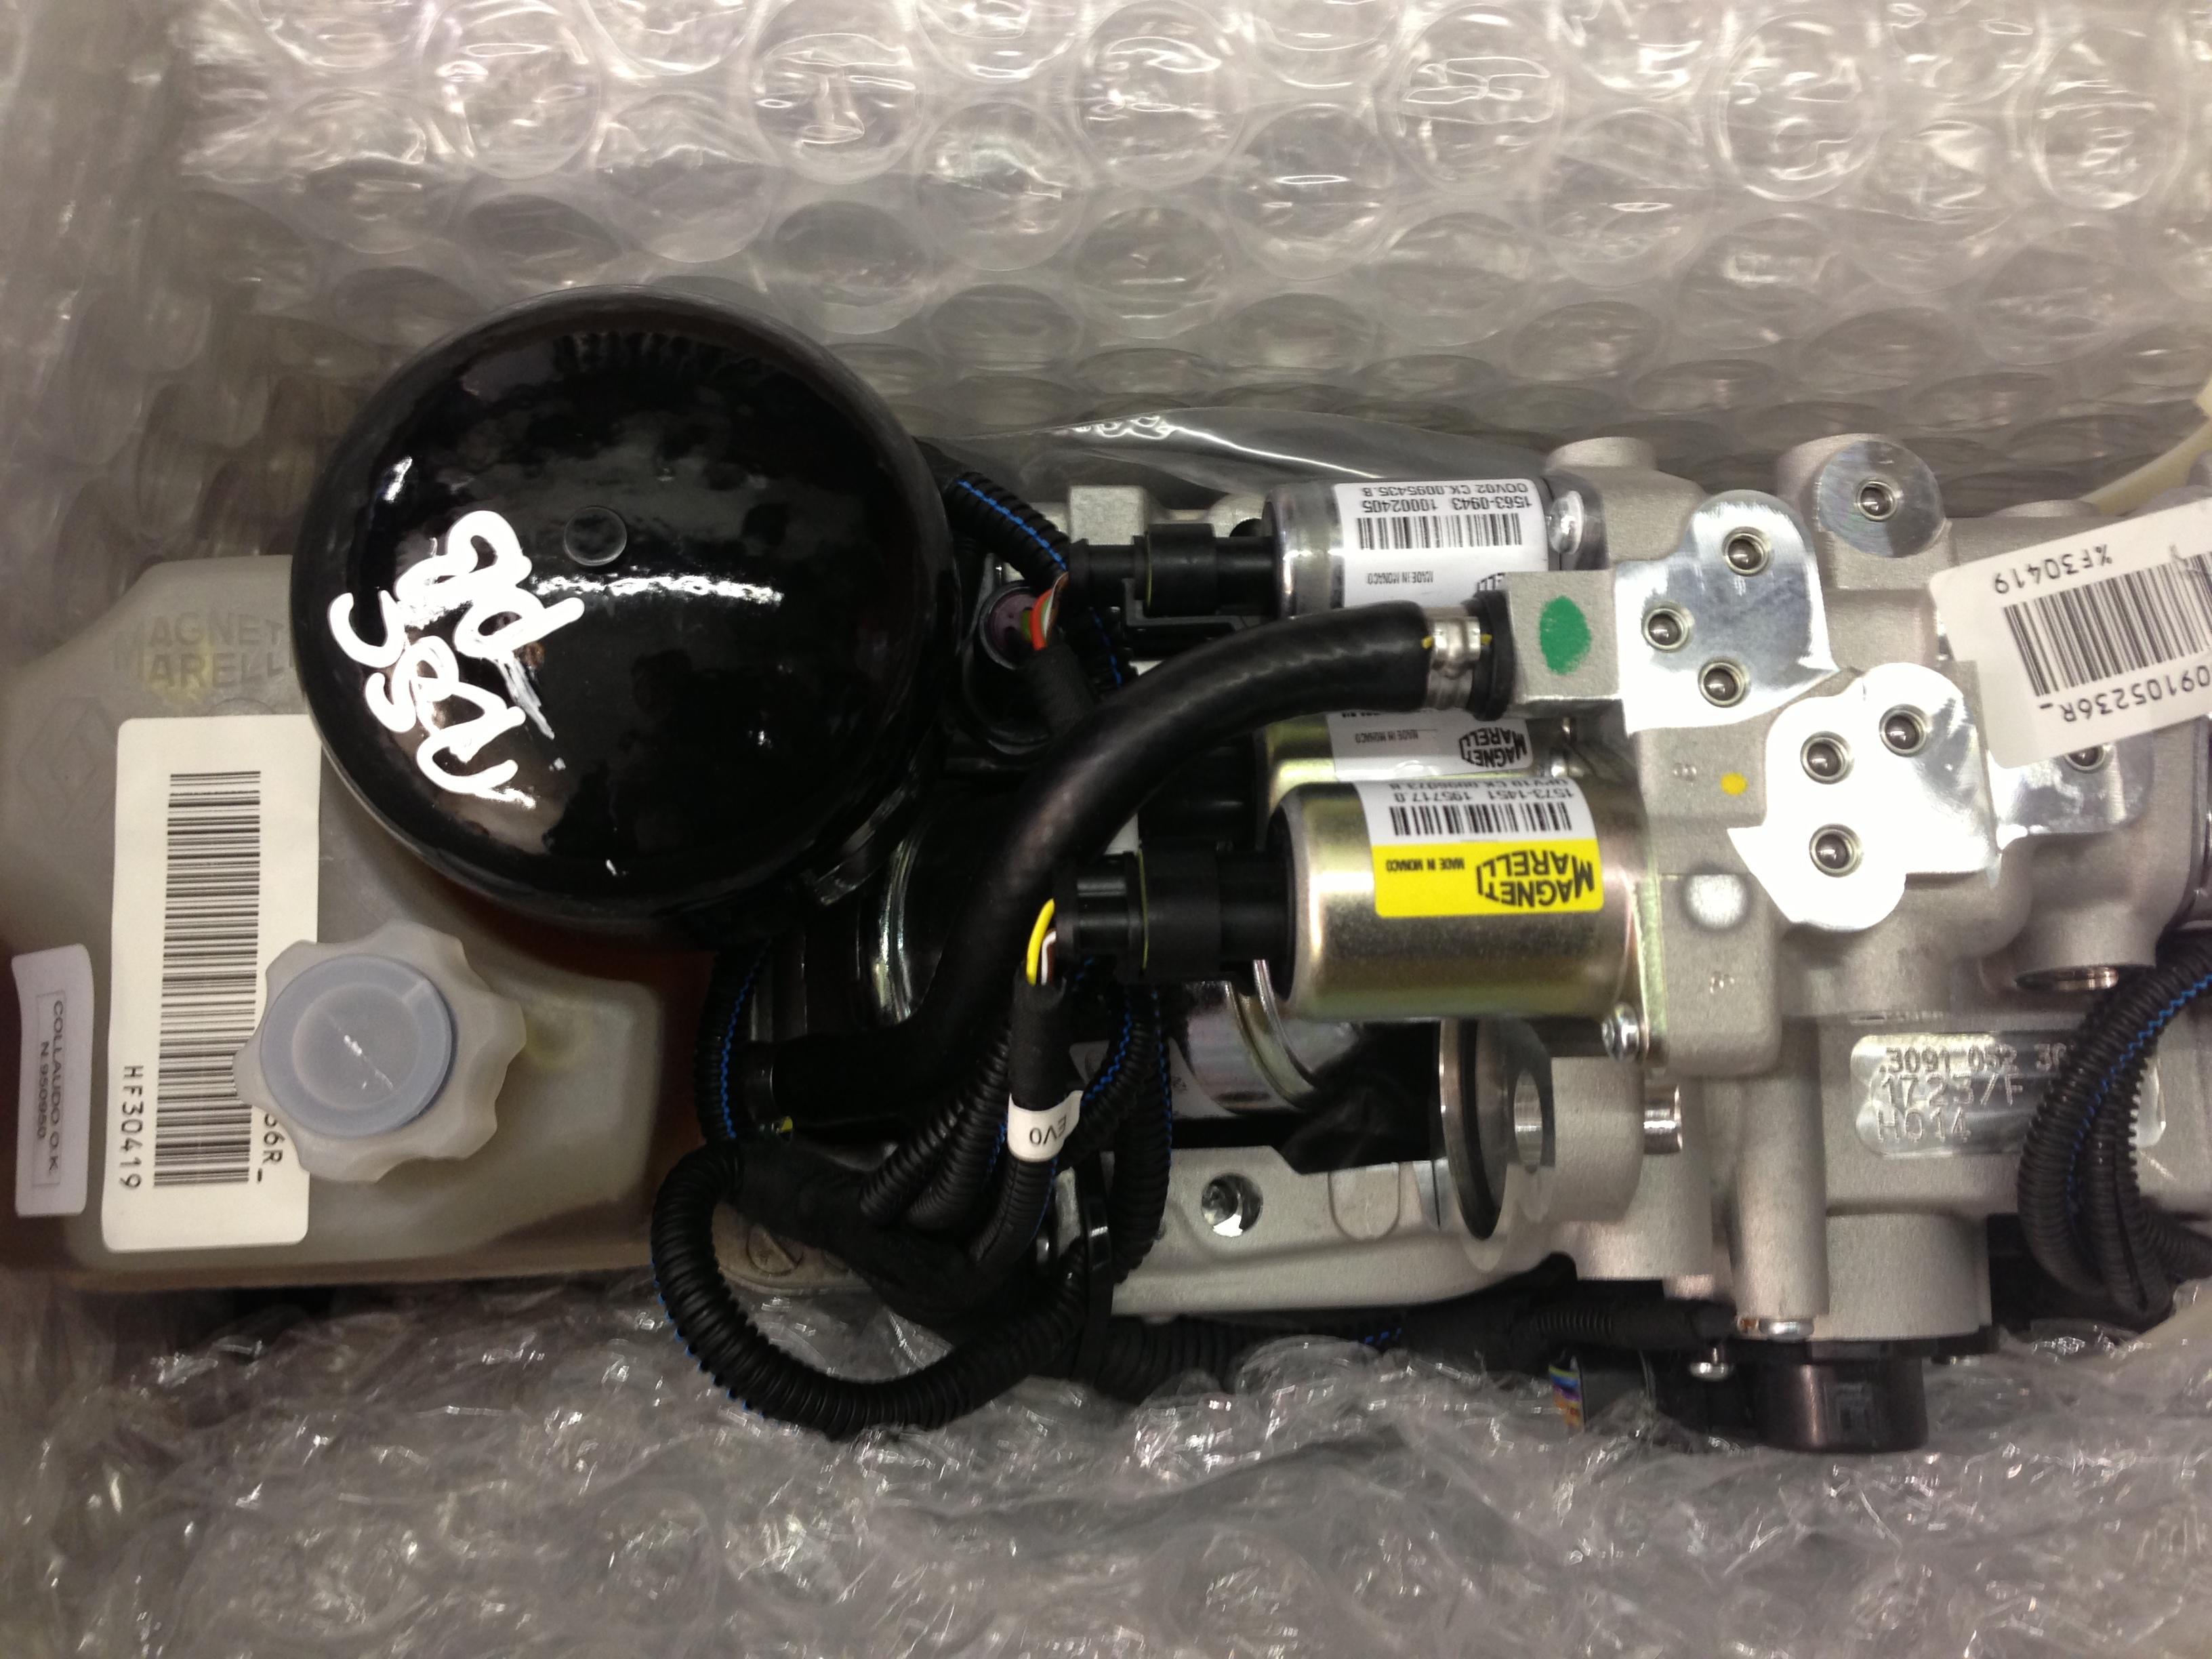 Vivaro 6 speed tiptronic -